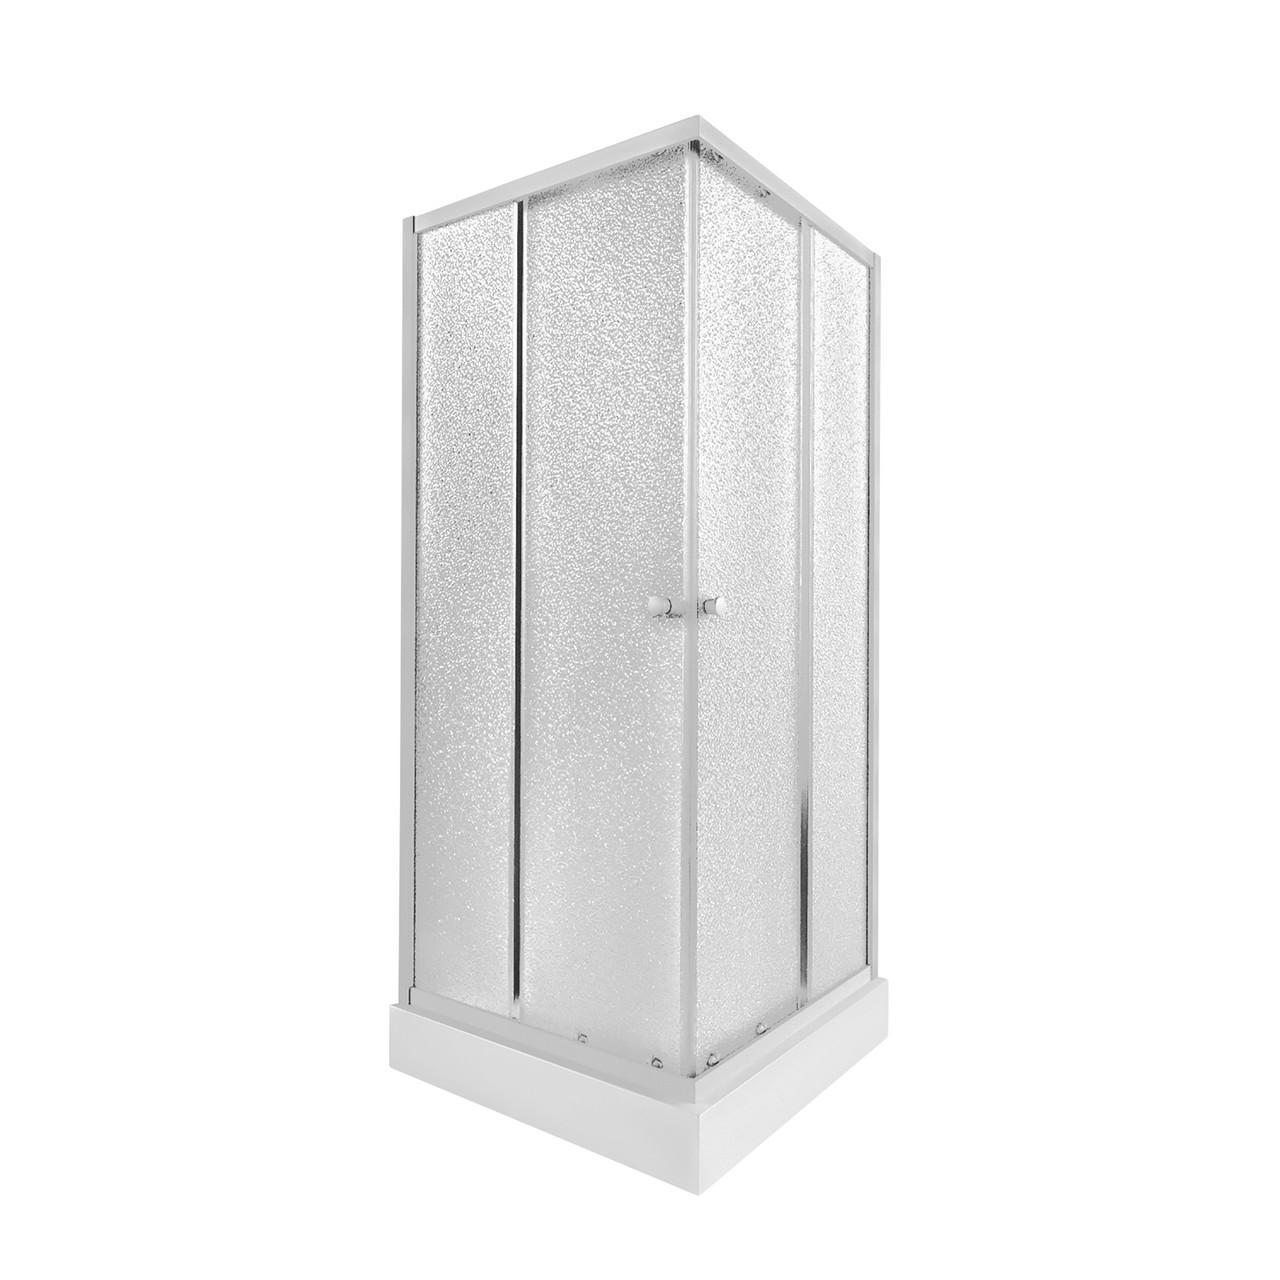 Набір Qtap душова кабіна Presto WHI1099SP5 Pear + піддон Unisquare 309915